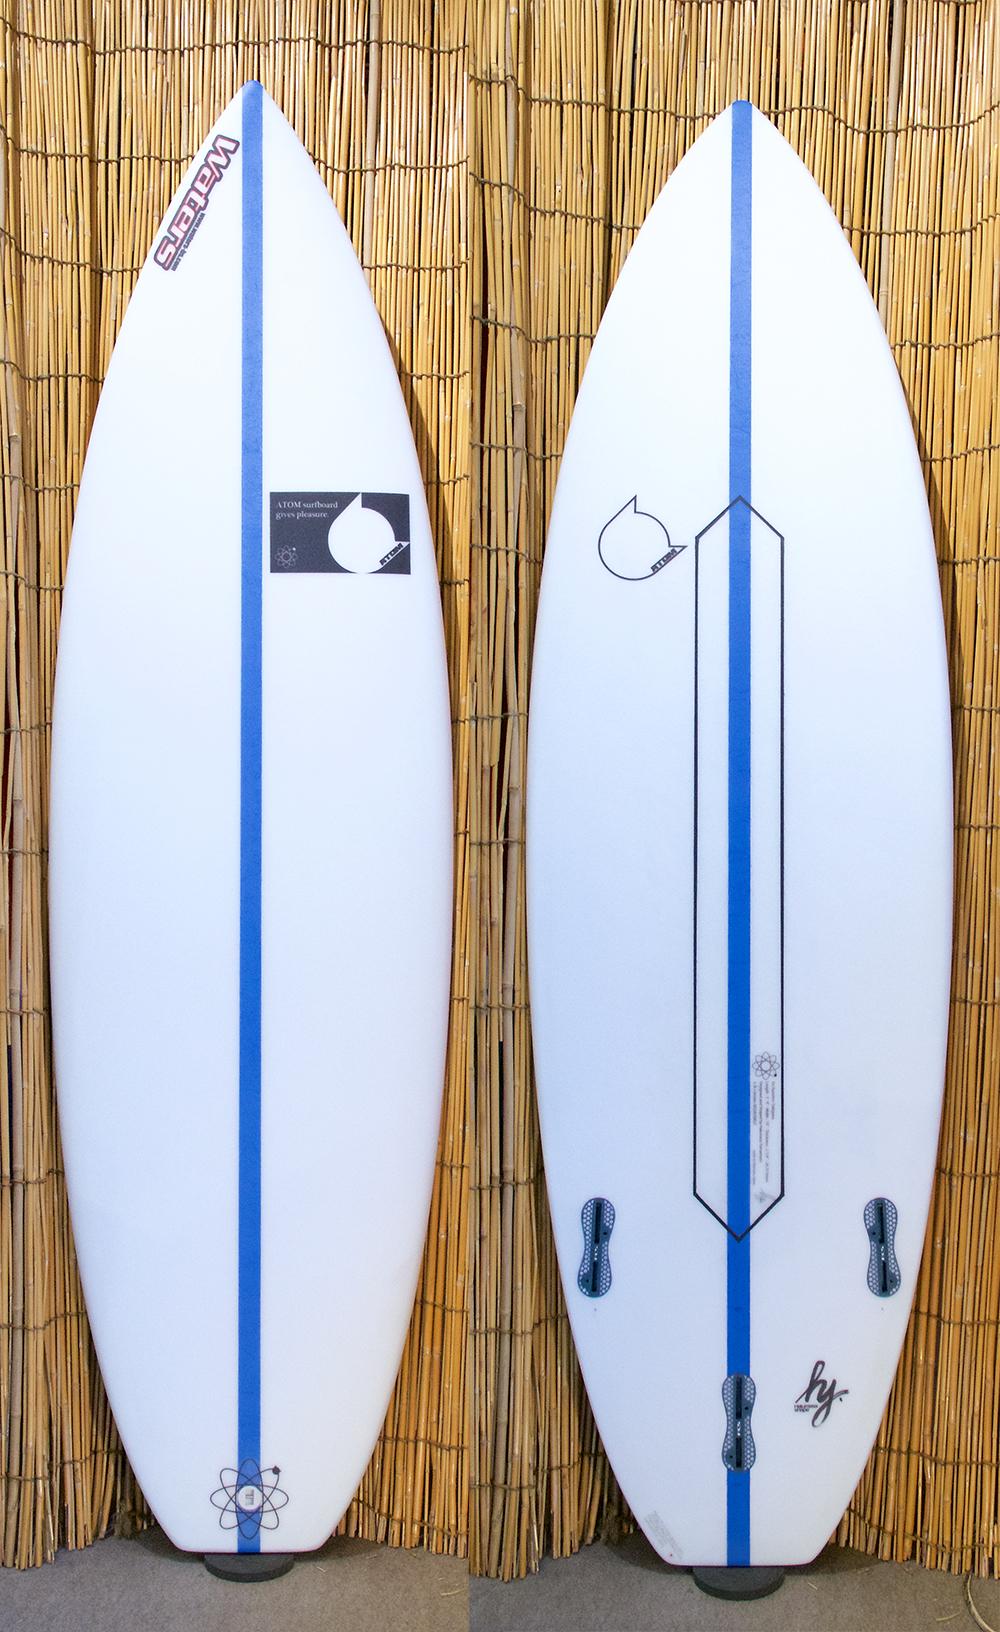 ATOM Surfboard Strider model by ATOM Tech